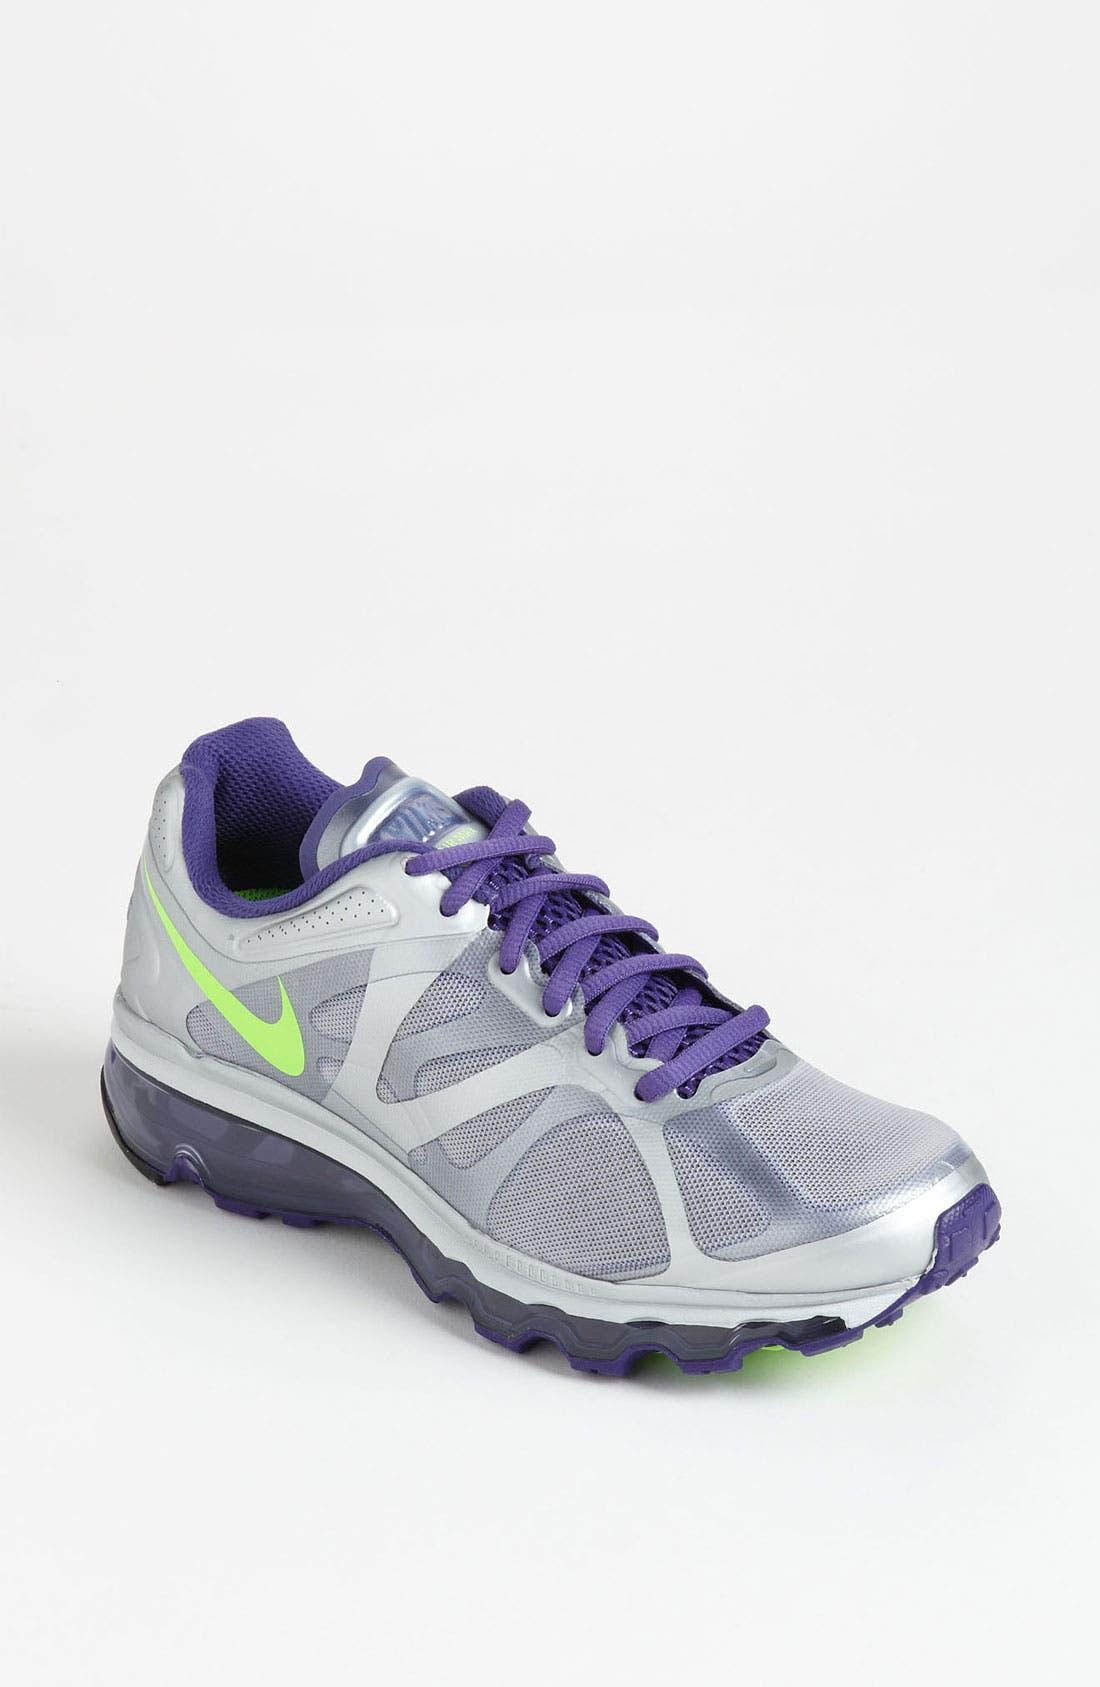 Alternate Image 1 Selected - Nike 'Air Max 2012' Running Shoe (Women)